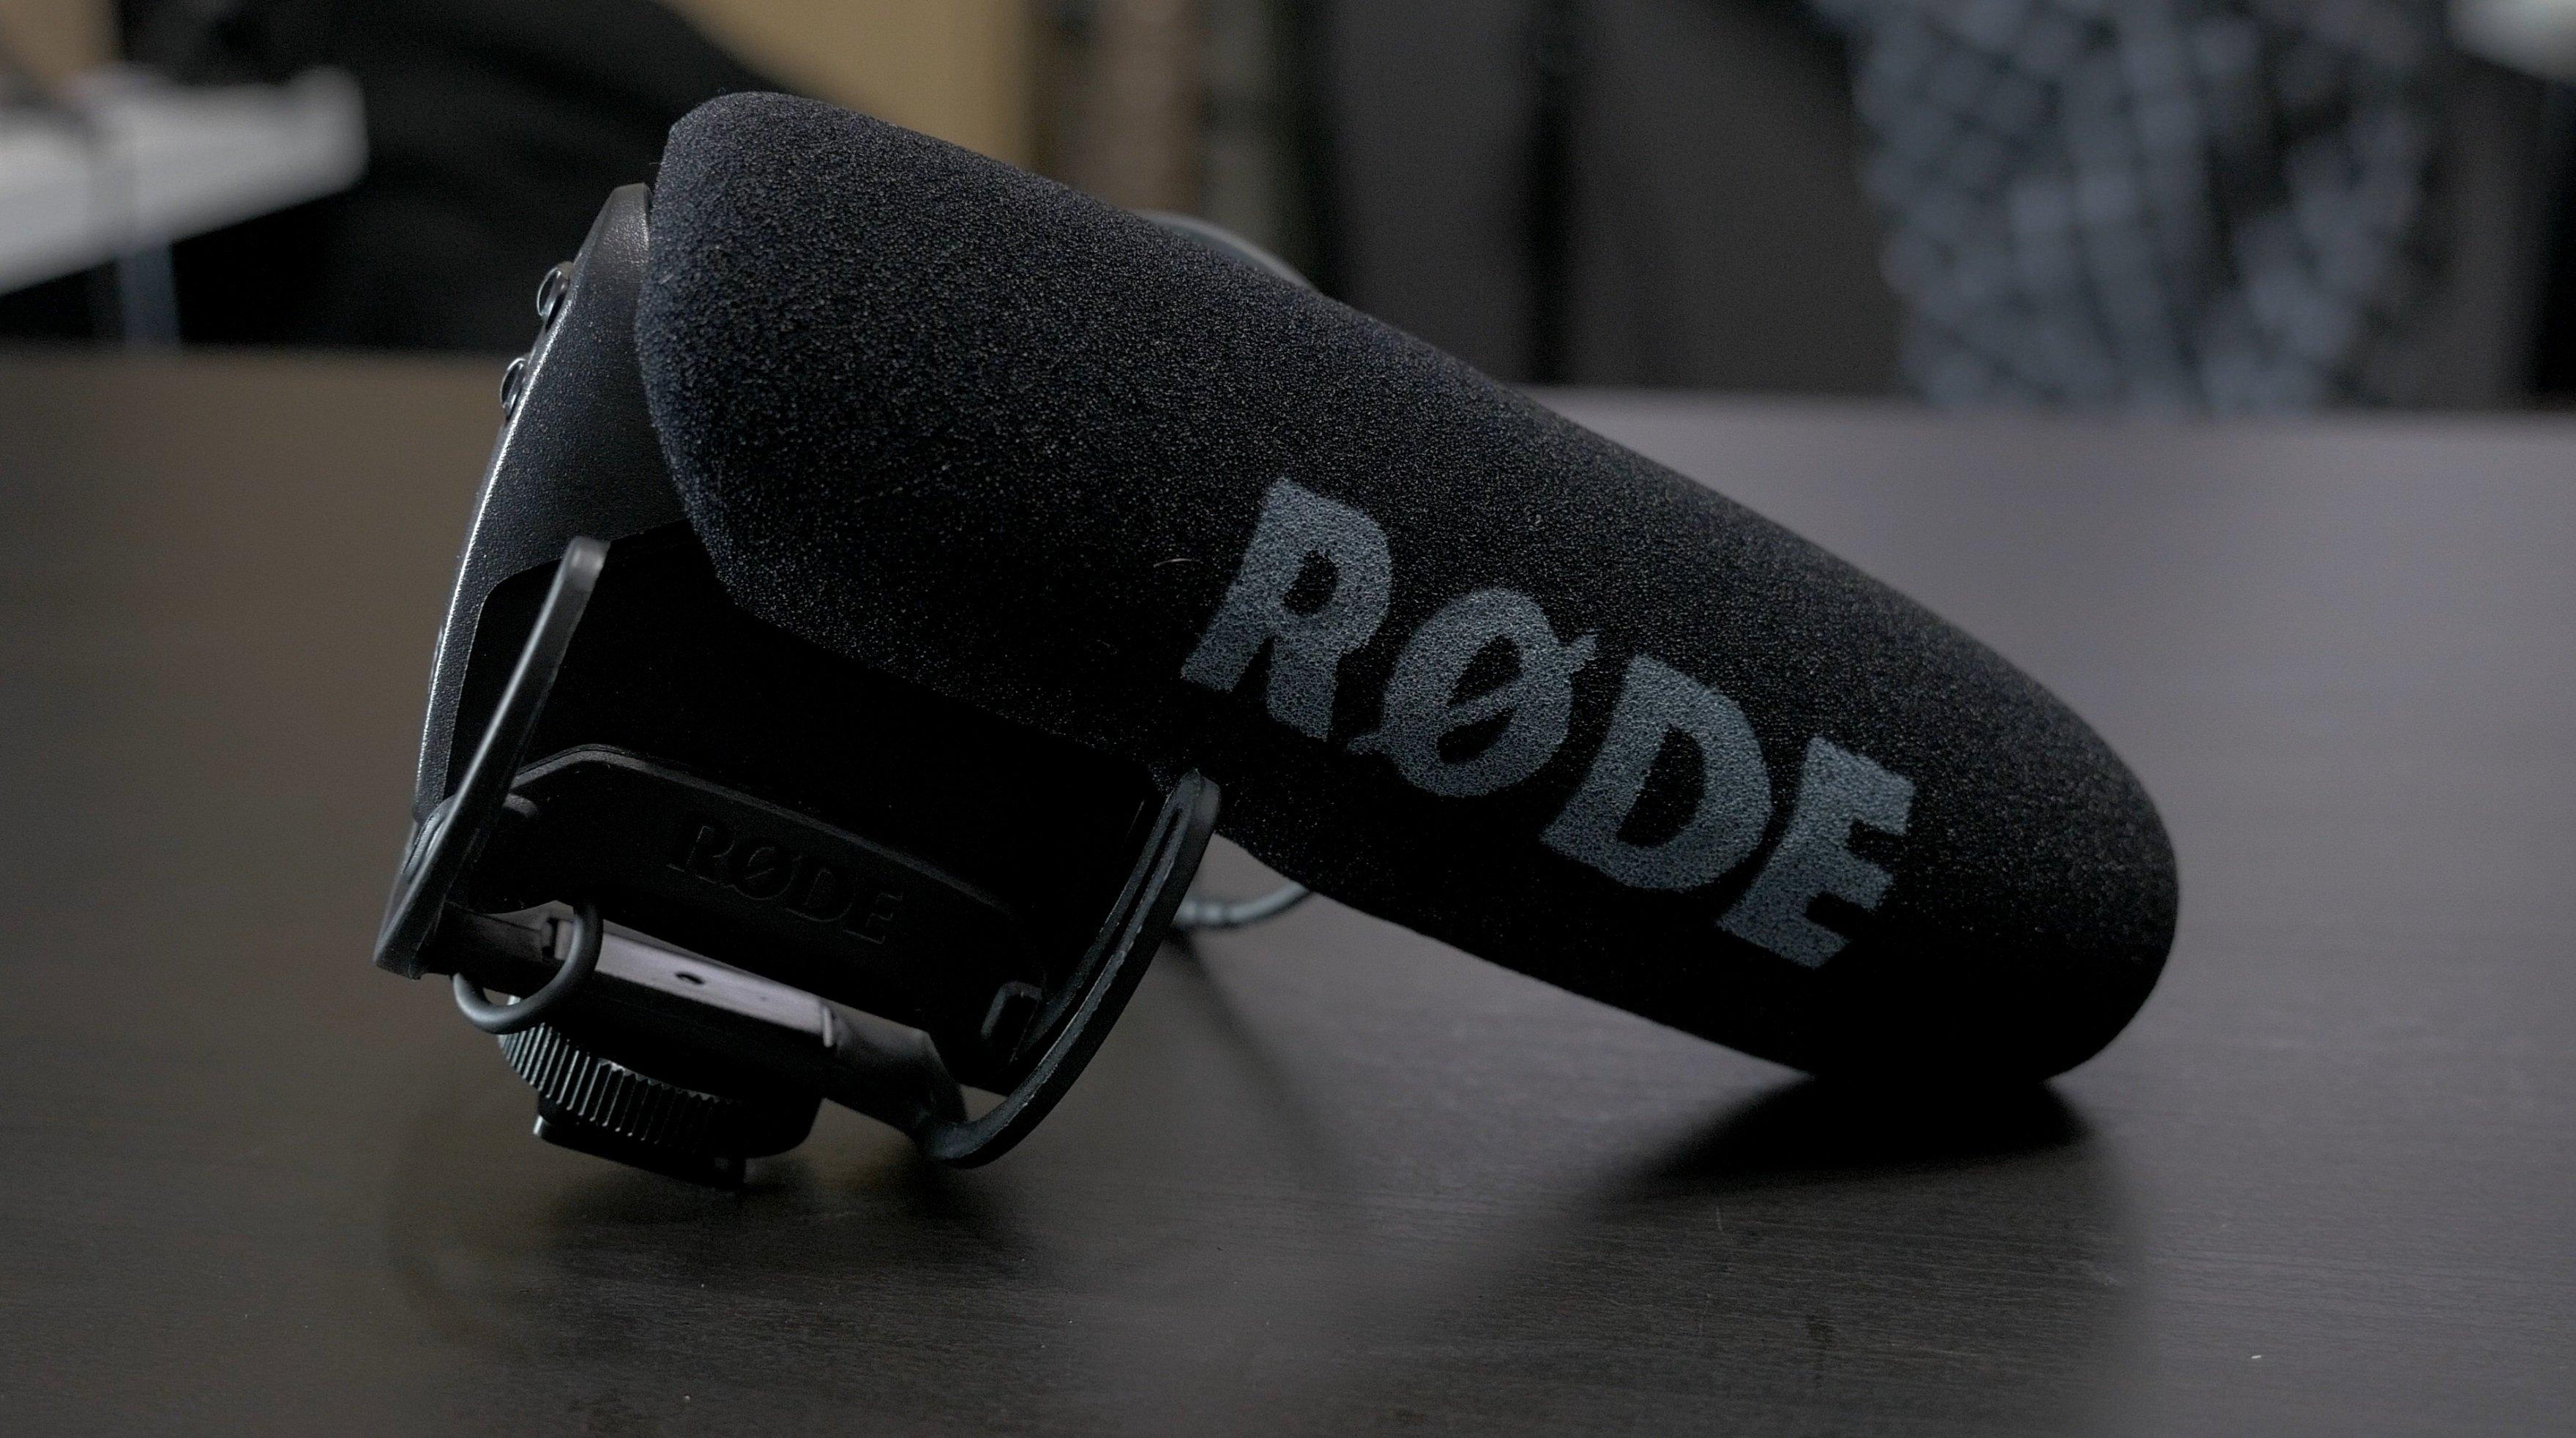 Rode VMPR Shotgun Vlog Microphone